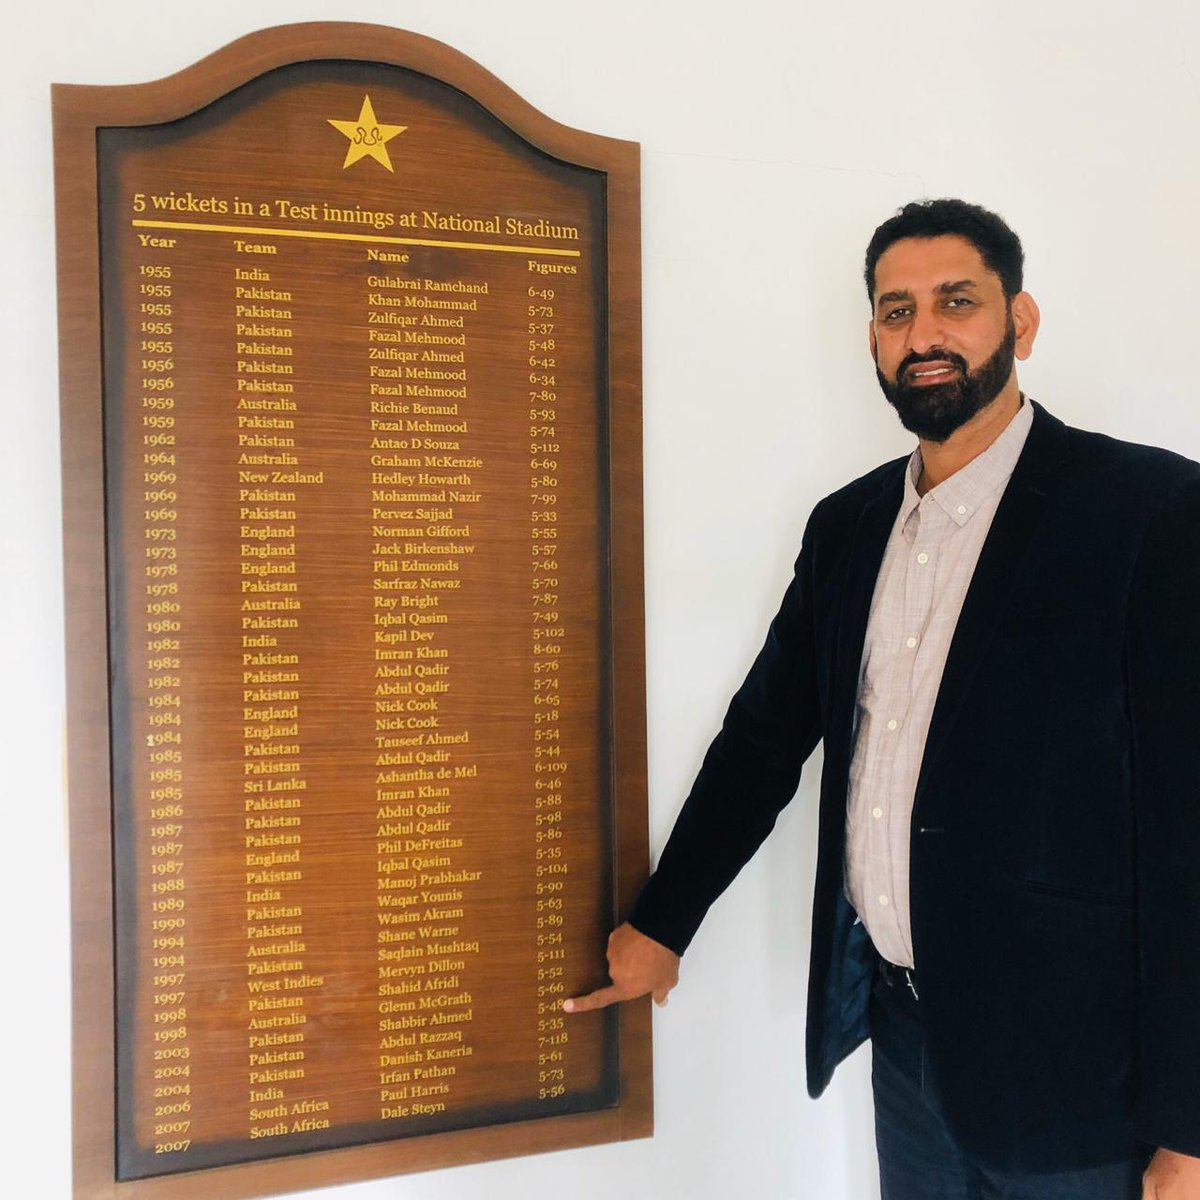 Khanewal express @ShabbirTestCric visited National Stadium, Karachi's honours board and recall his 5-wicket haul he took against Bangladesh in 2003 on debut.  #Cricket #Pakistan #ShabbirAhmed #QeA20 #Karachi #HarHaalMainCricket